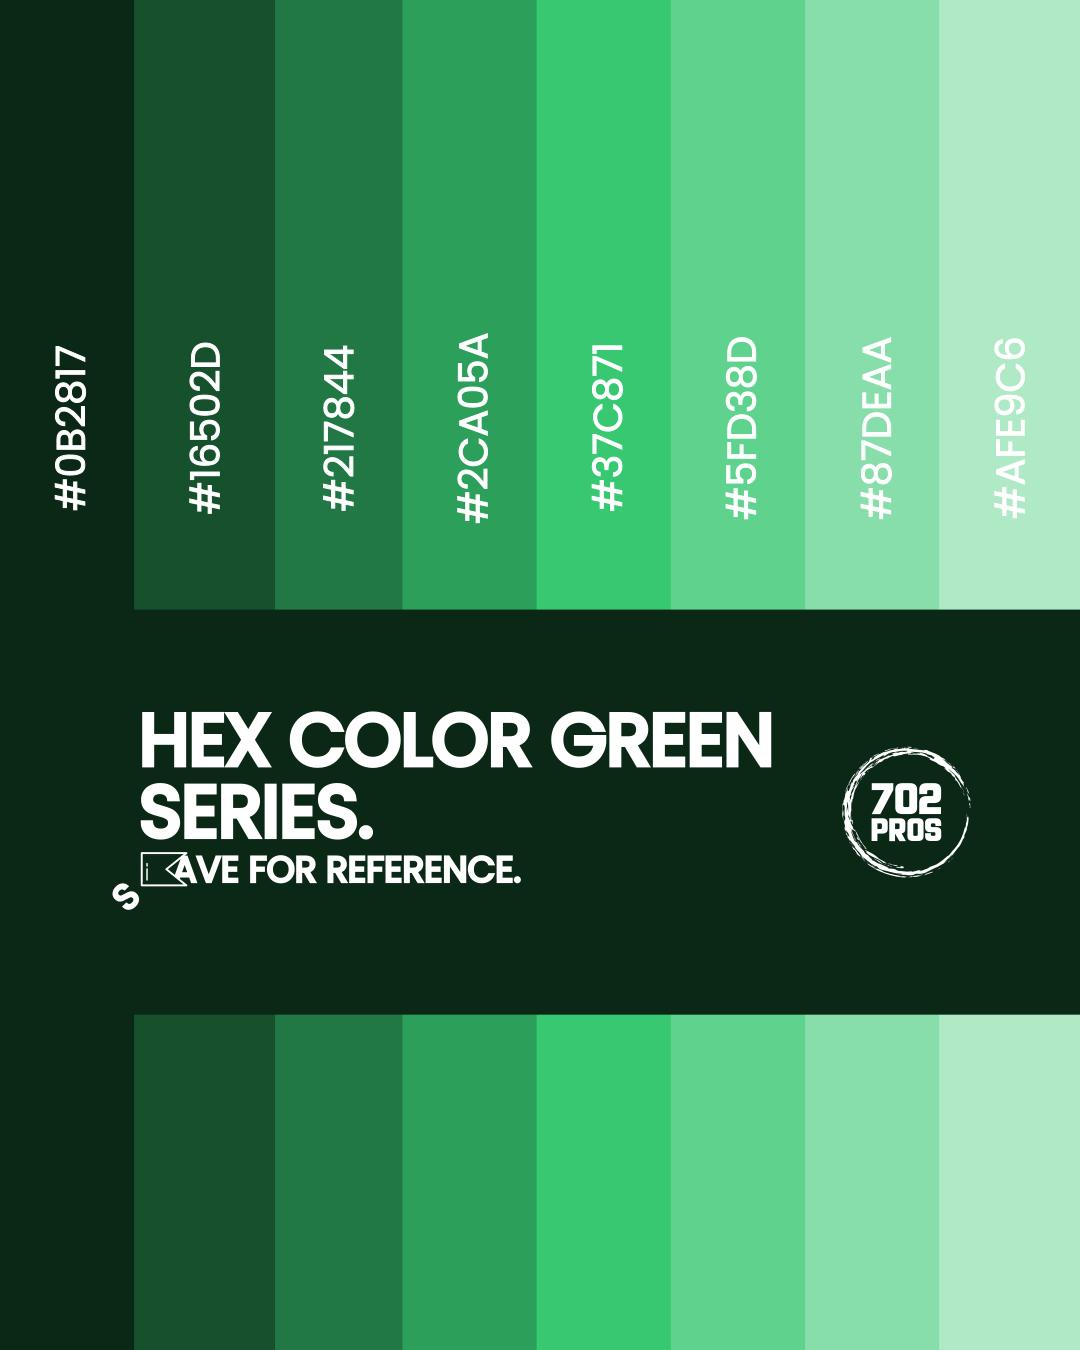 Web design rules | color contrast | Hex Color Green Series - slide 5